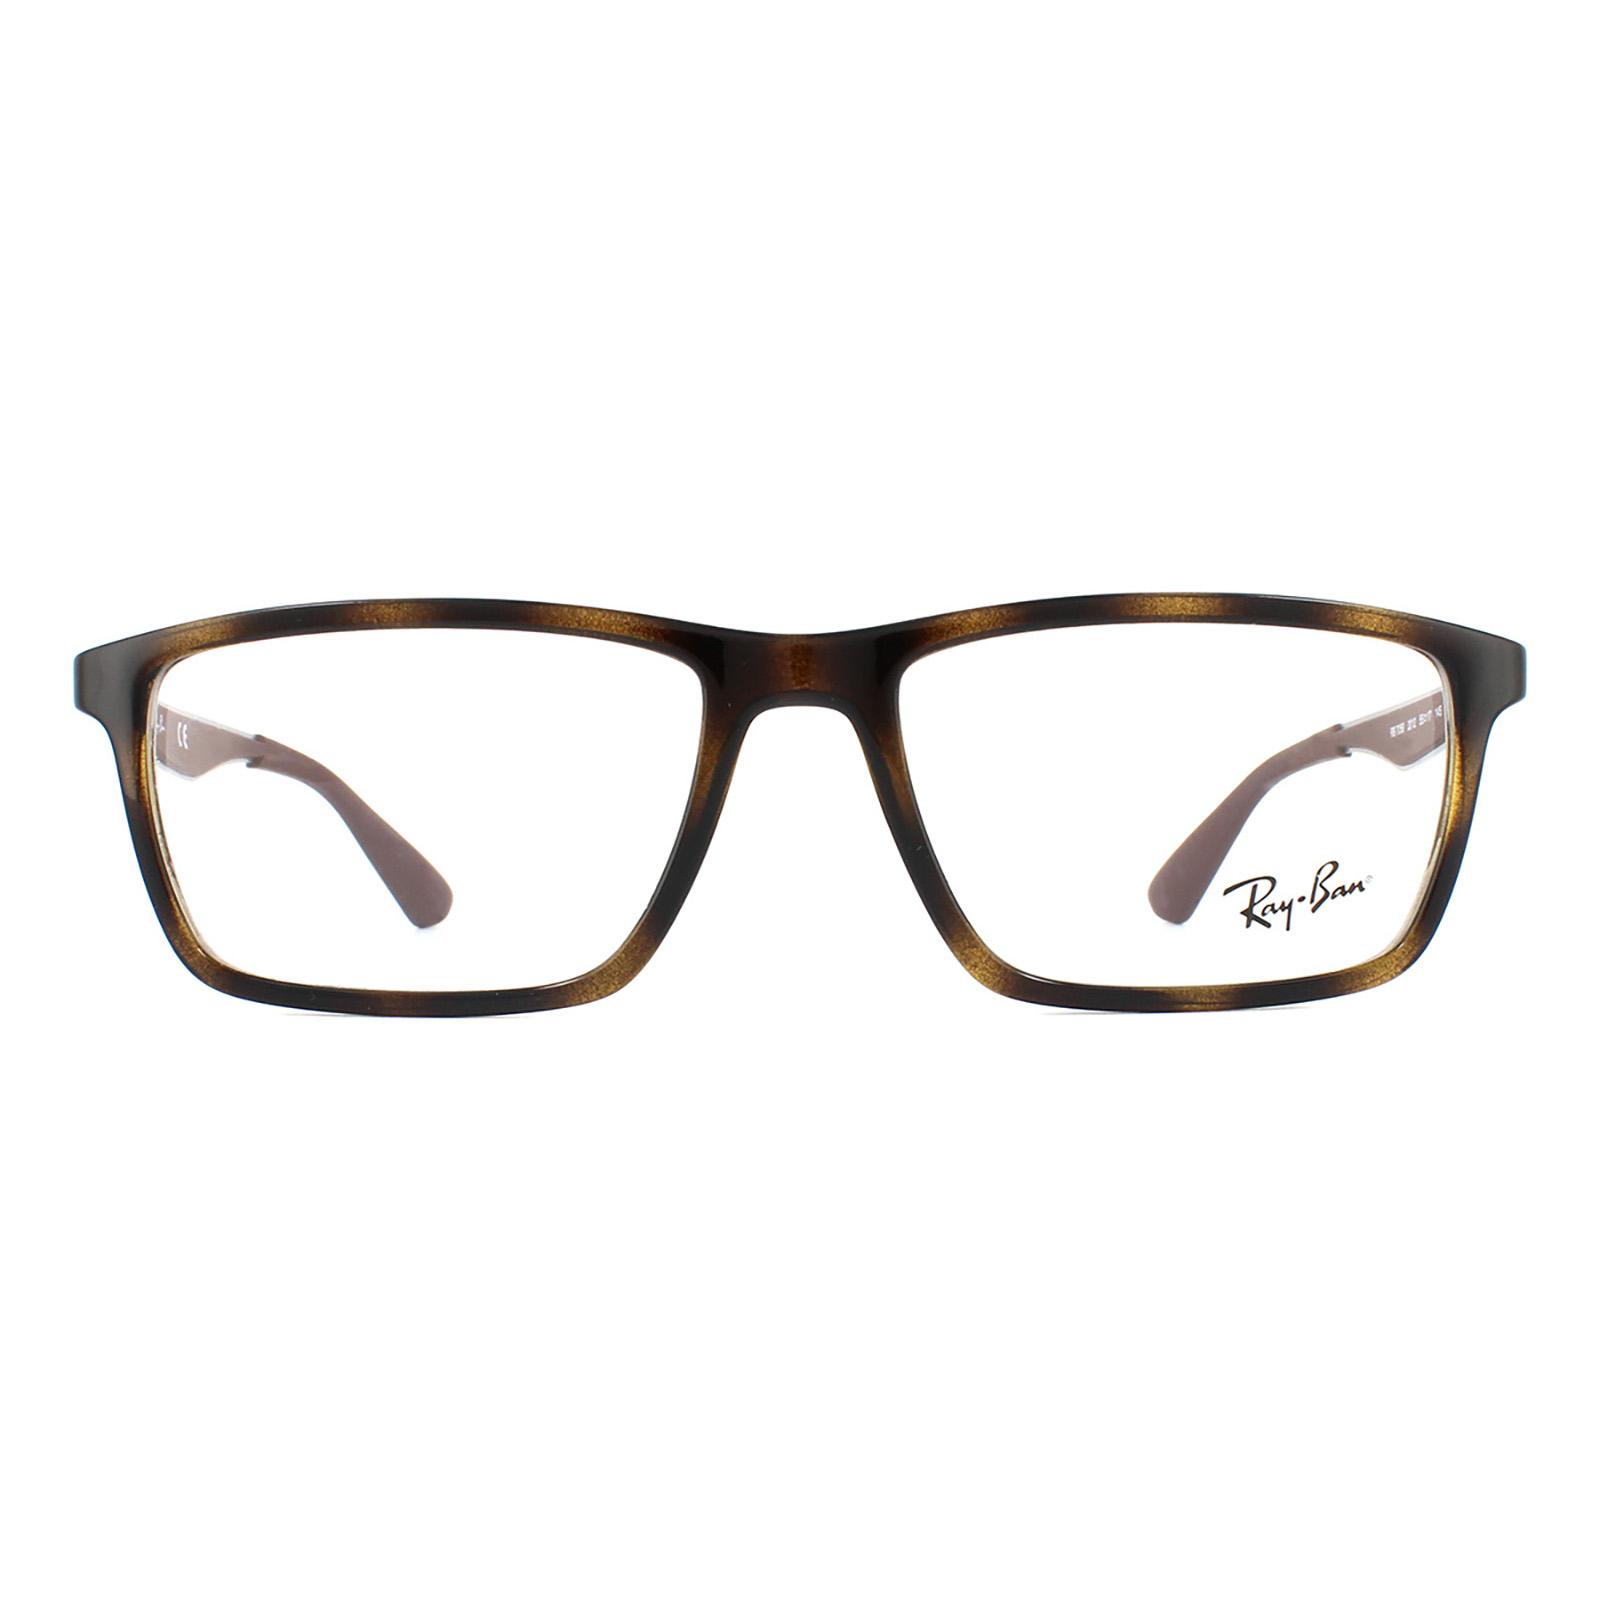 Ray-Ban Glasses Frames 7056 2012 Shiny Havana Men 55mm   eBay